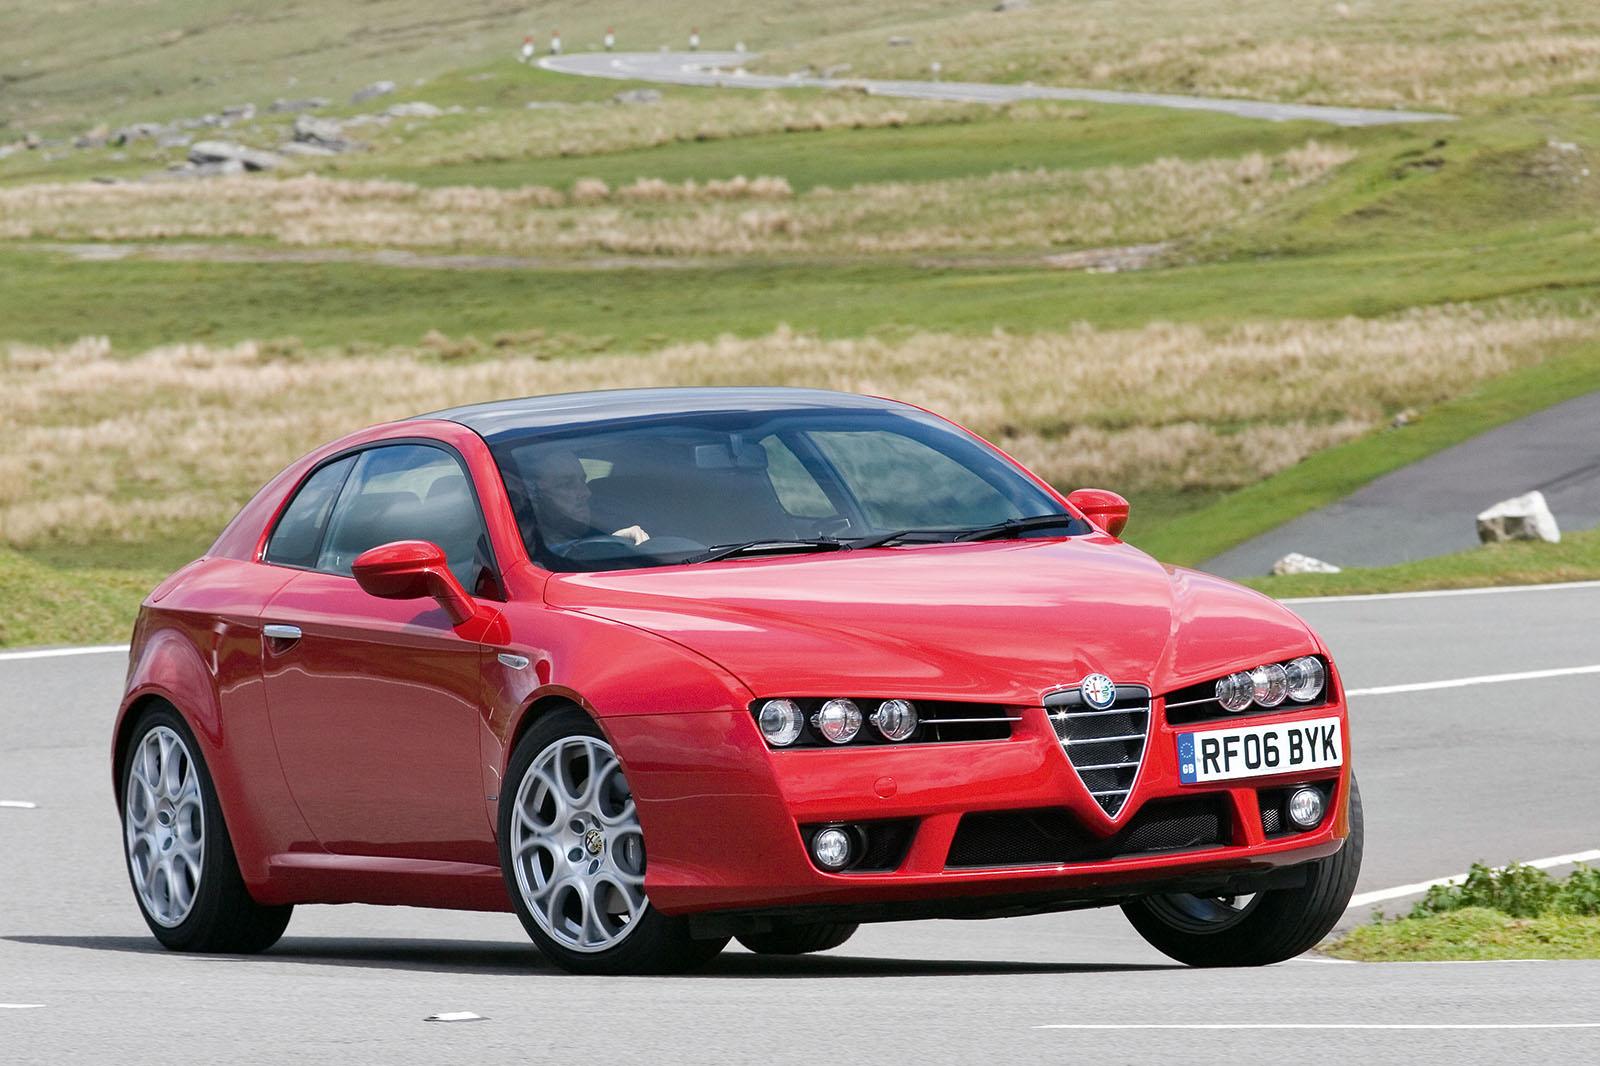 Alfa Romeo Brera Used Car Buying Guide Autocar Timing Belt 2007 Mazda Pick Up